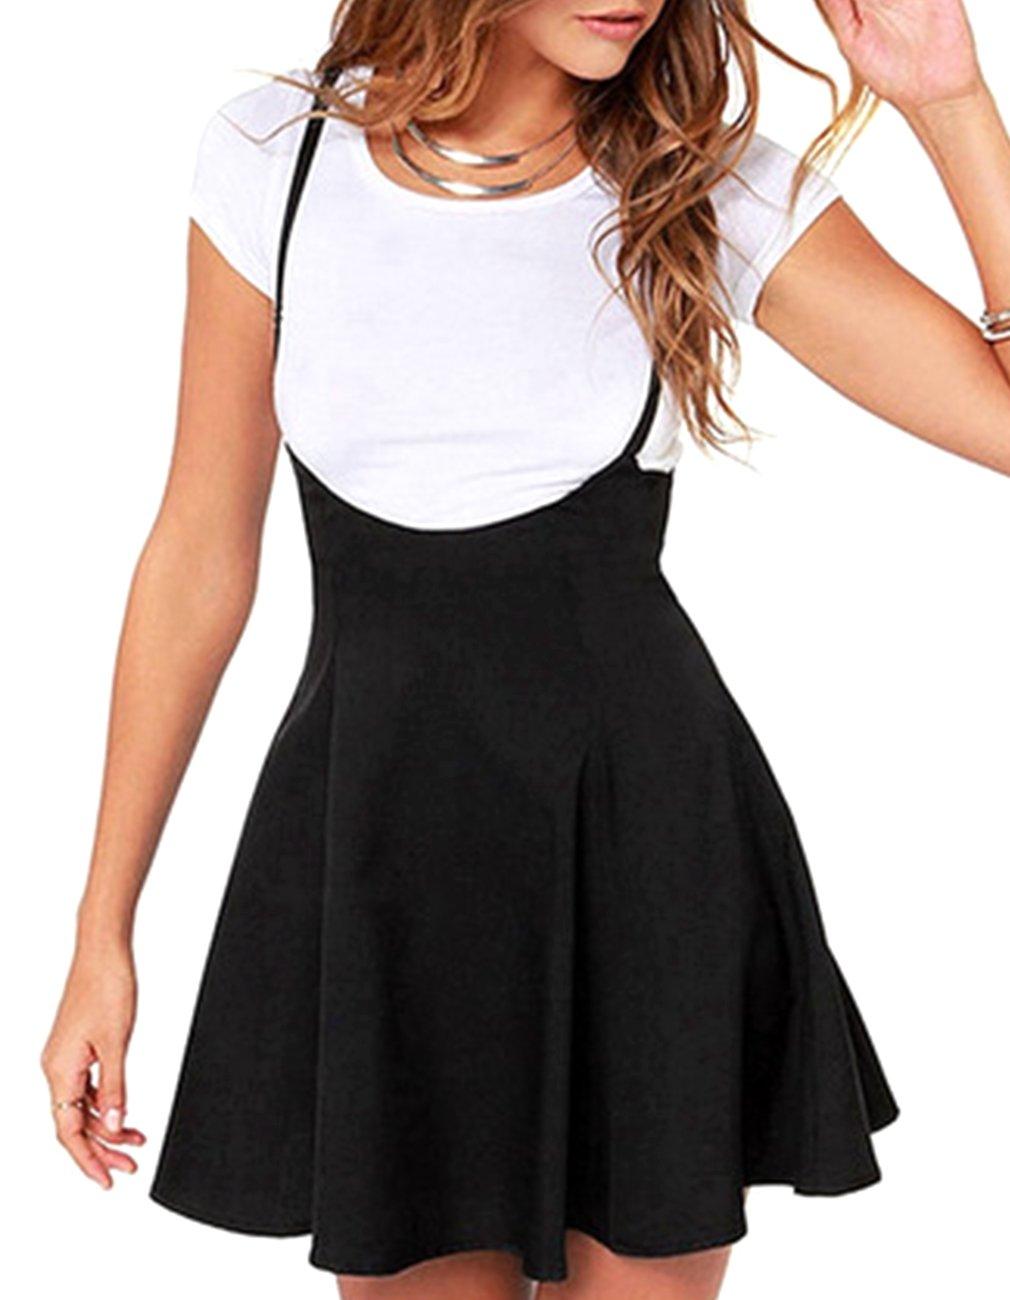 cddda8b3f74 Womens Suspender Skirts Dress Basic High Waist Versatile Flare Skater Skirt  Casual Shoulder Straps A Line Skirt (X-Large